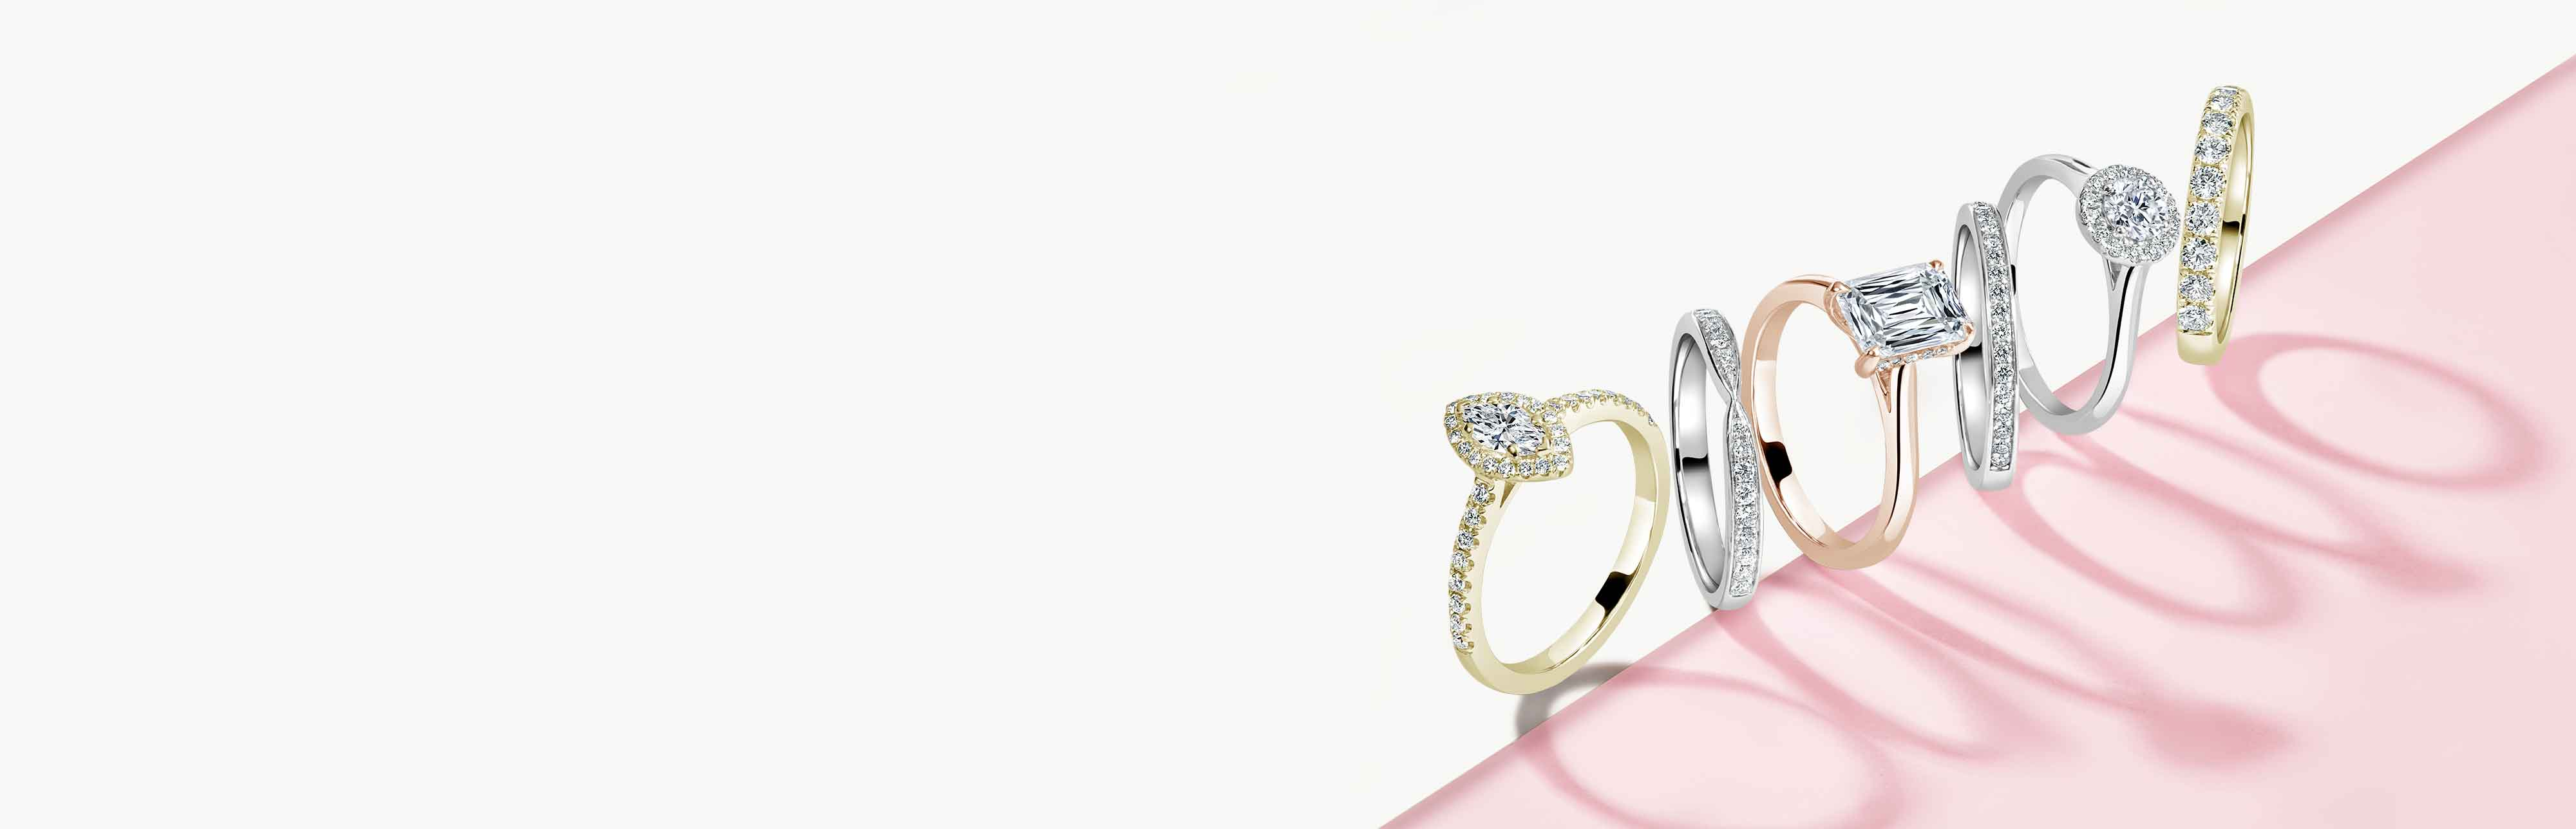 Princess Cut Halo Engagement Rings - Steven Stone